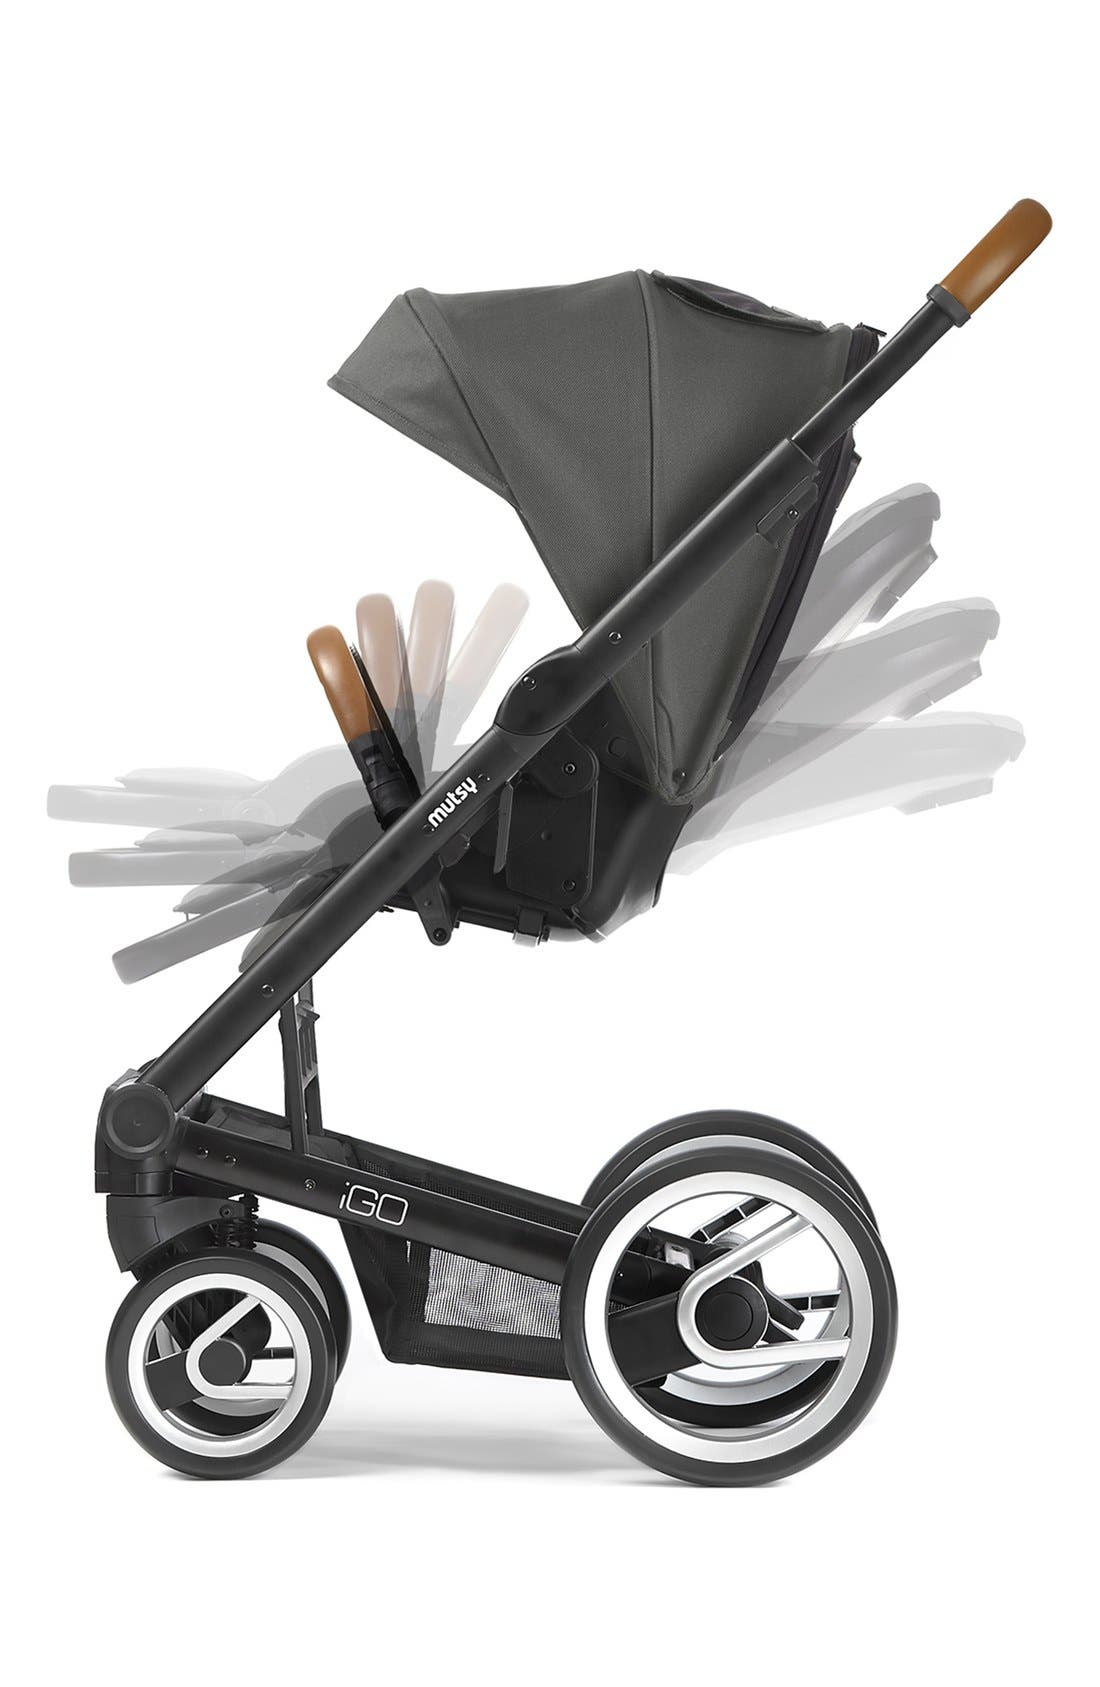 Igo - Urban Nomad Stroller,                             Alternate thumbnail 6, color,                             020